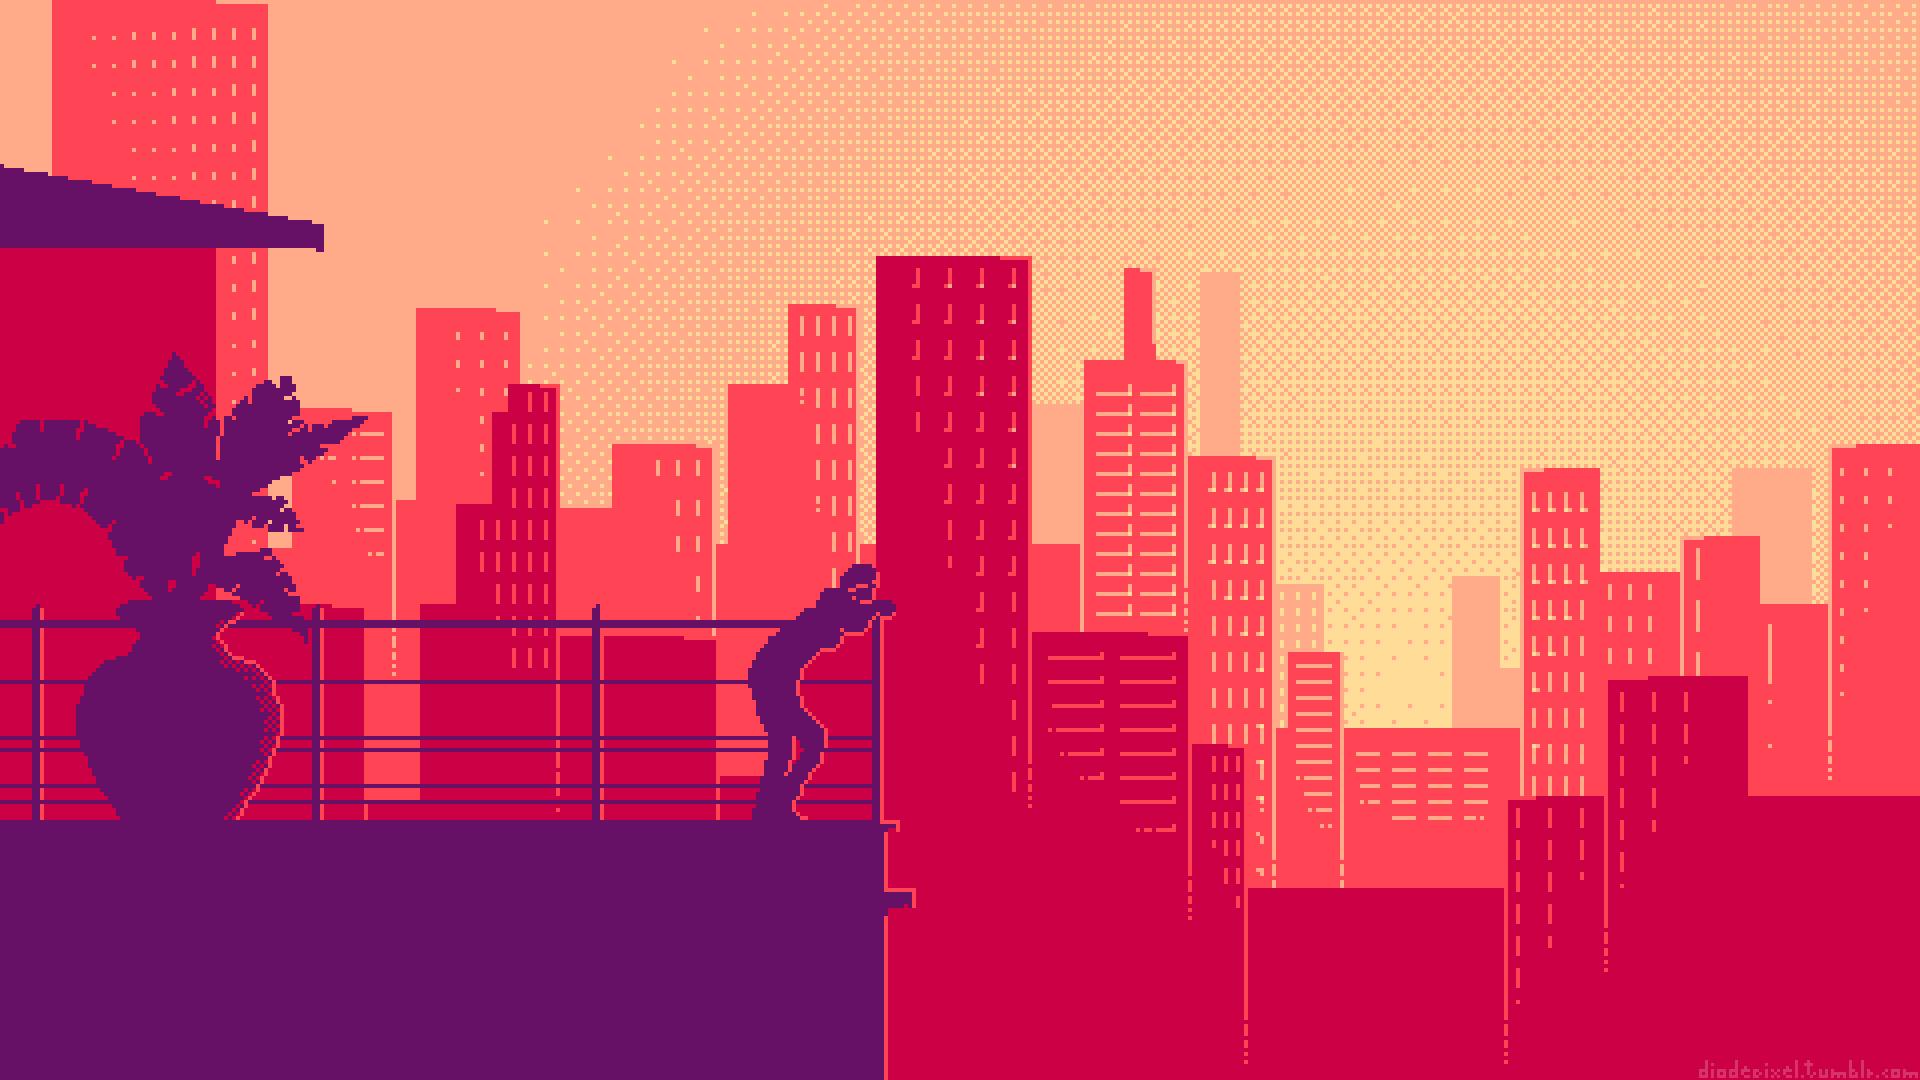 Pixel Art HD Wallpaper | Background Image | 1920x1080 | ID:846697 ...